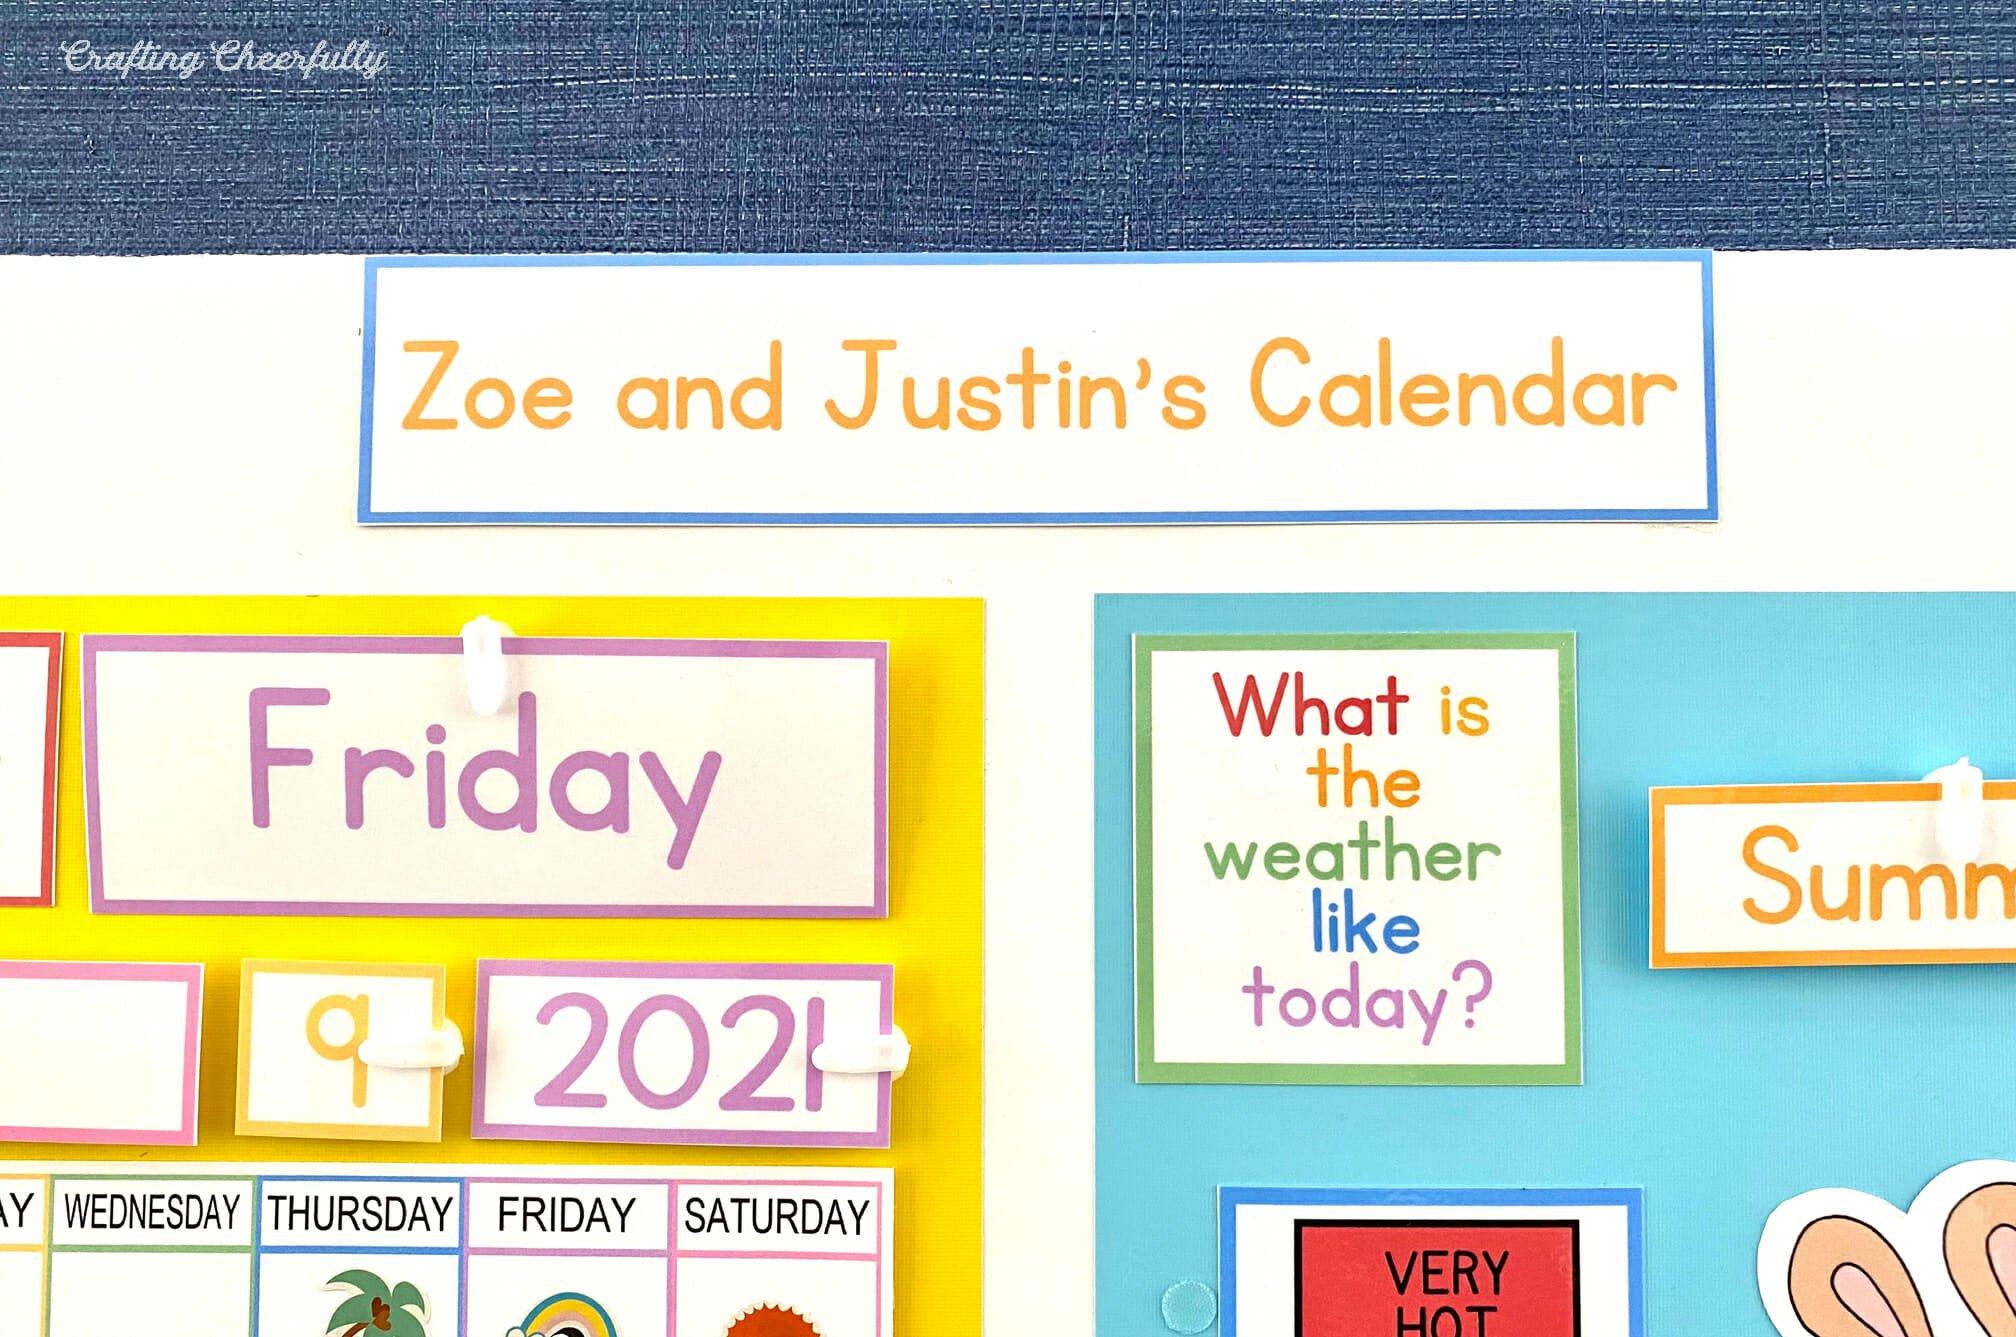 Children's Calendar personlized with children's names.